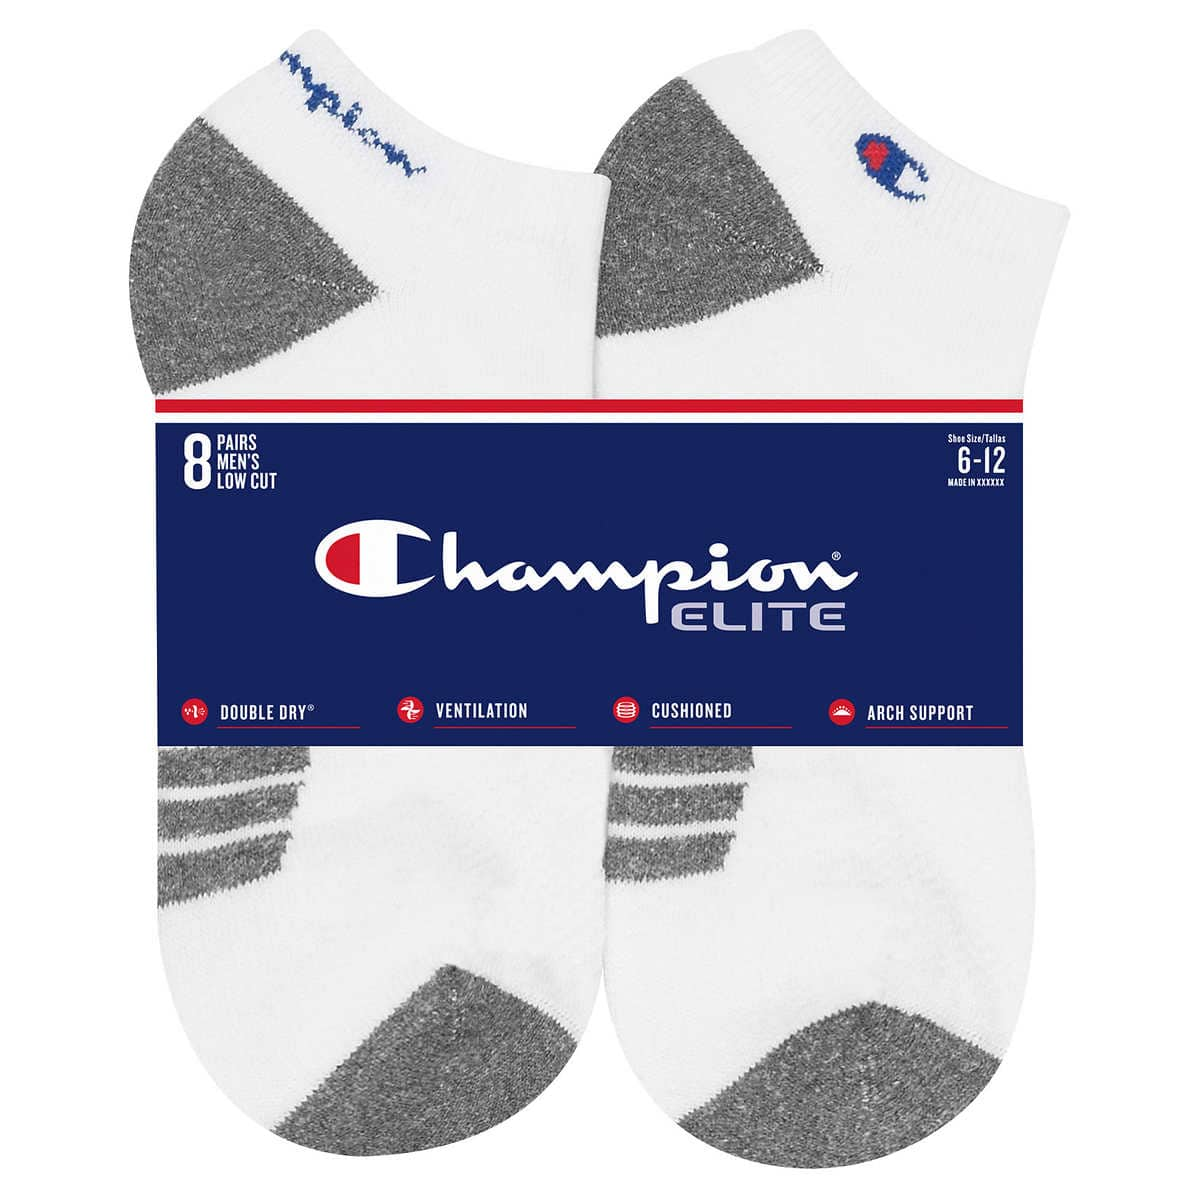 8-pair Champion Men's Low Cut Sock (Black or White) $10.99 + FS @ Costco